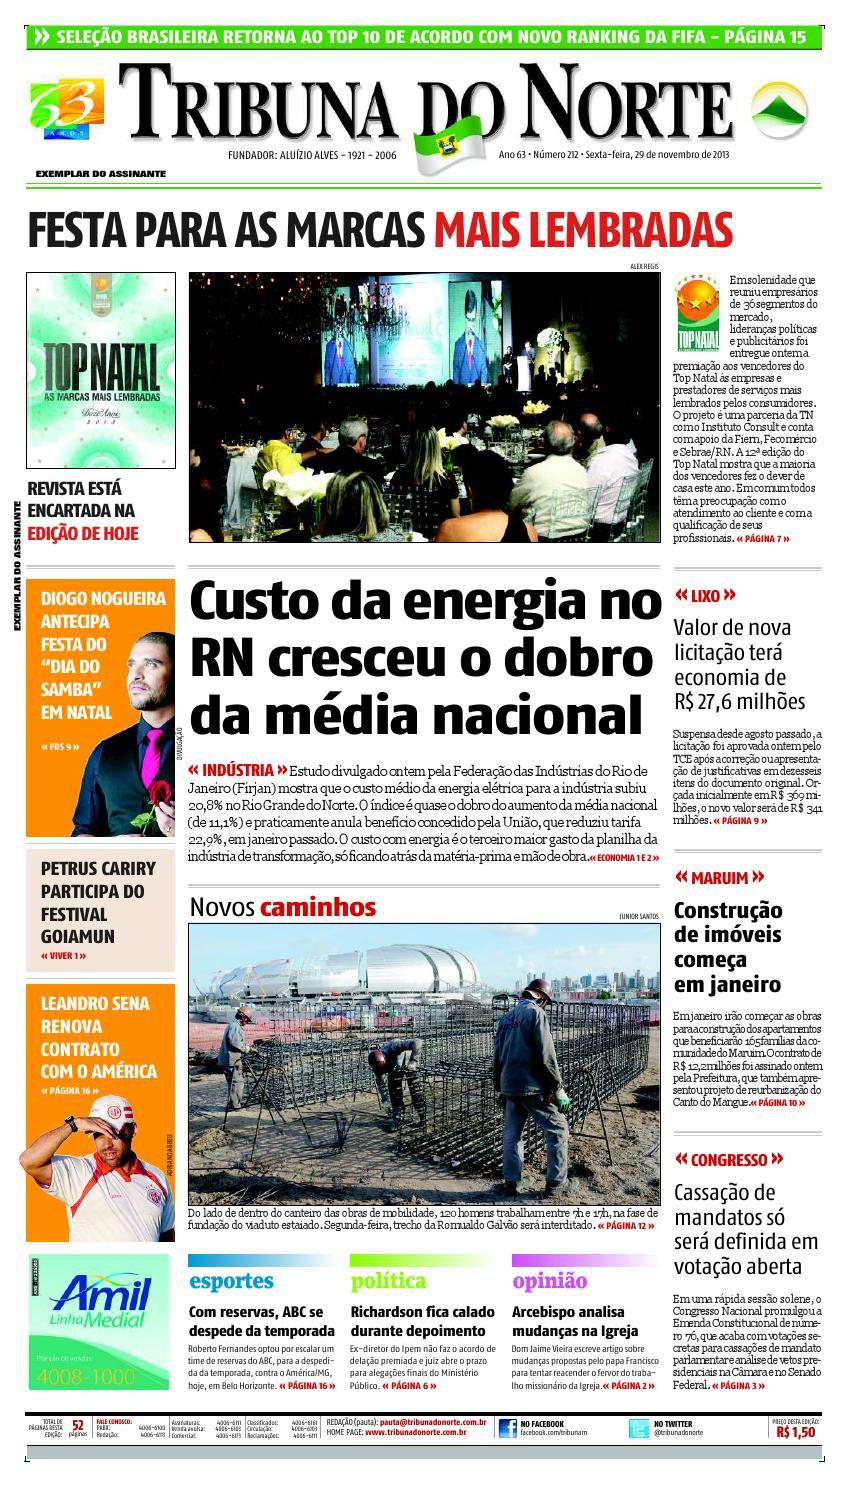 8544acd972e49 Tribuna do Norte - 29 11 2013 by Empresa Jornalística Tribuna do Norte Ltda  - issuu